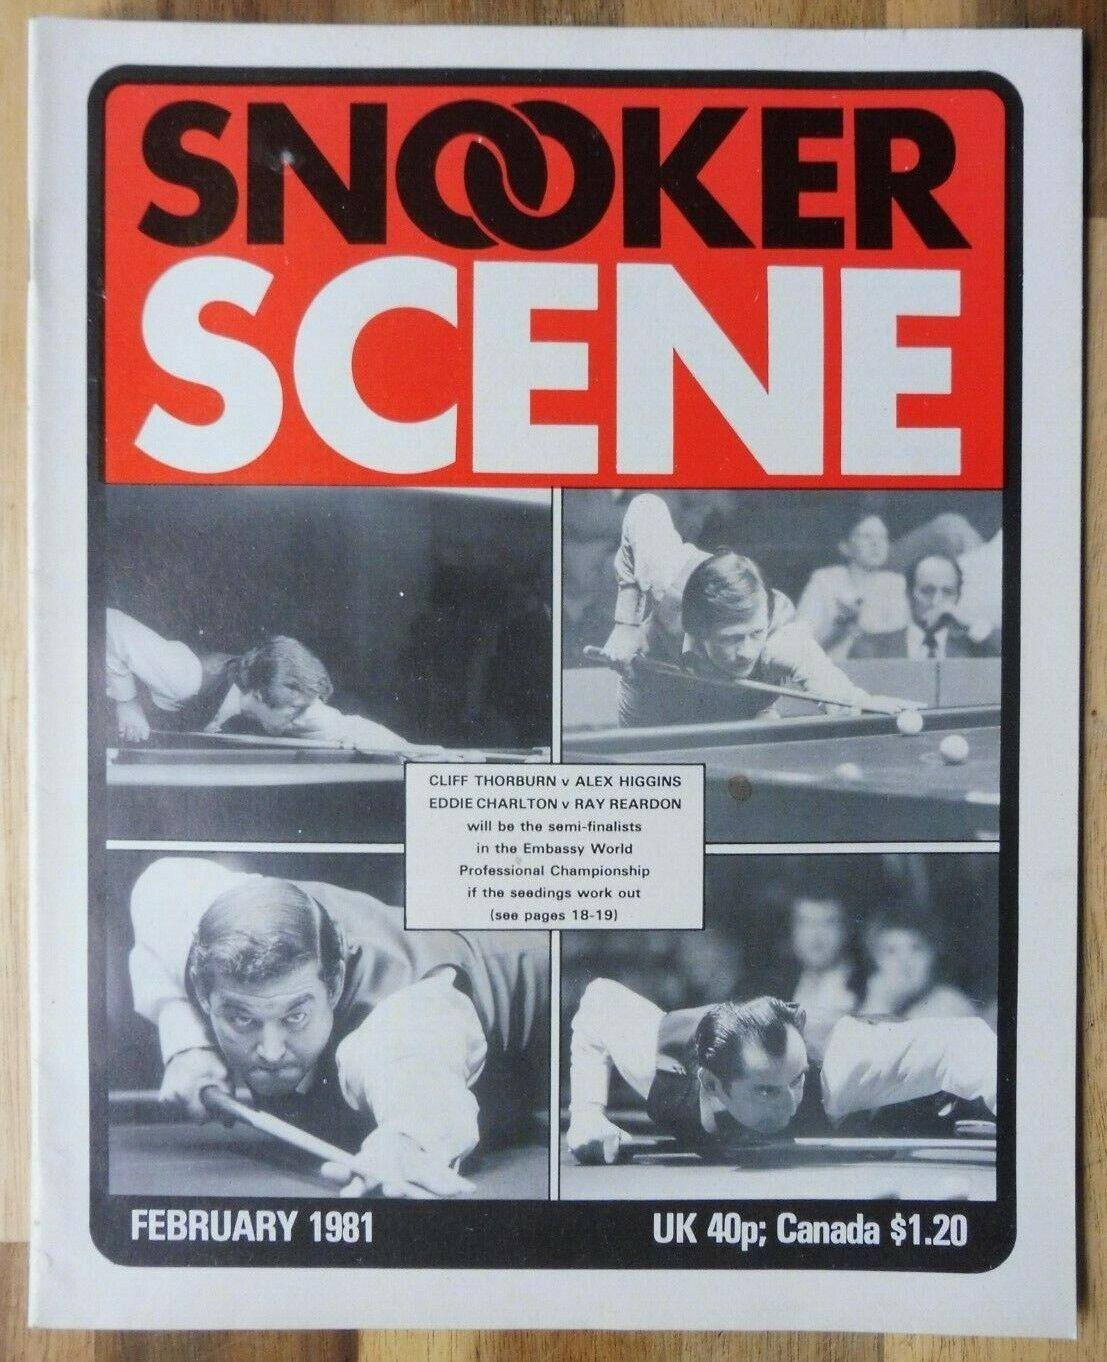 Snooker Scene Magazine, February 1981, Good Condition.